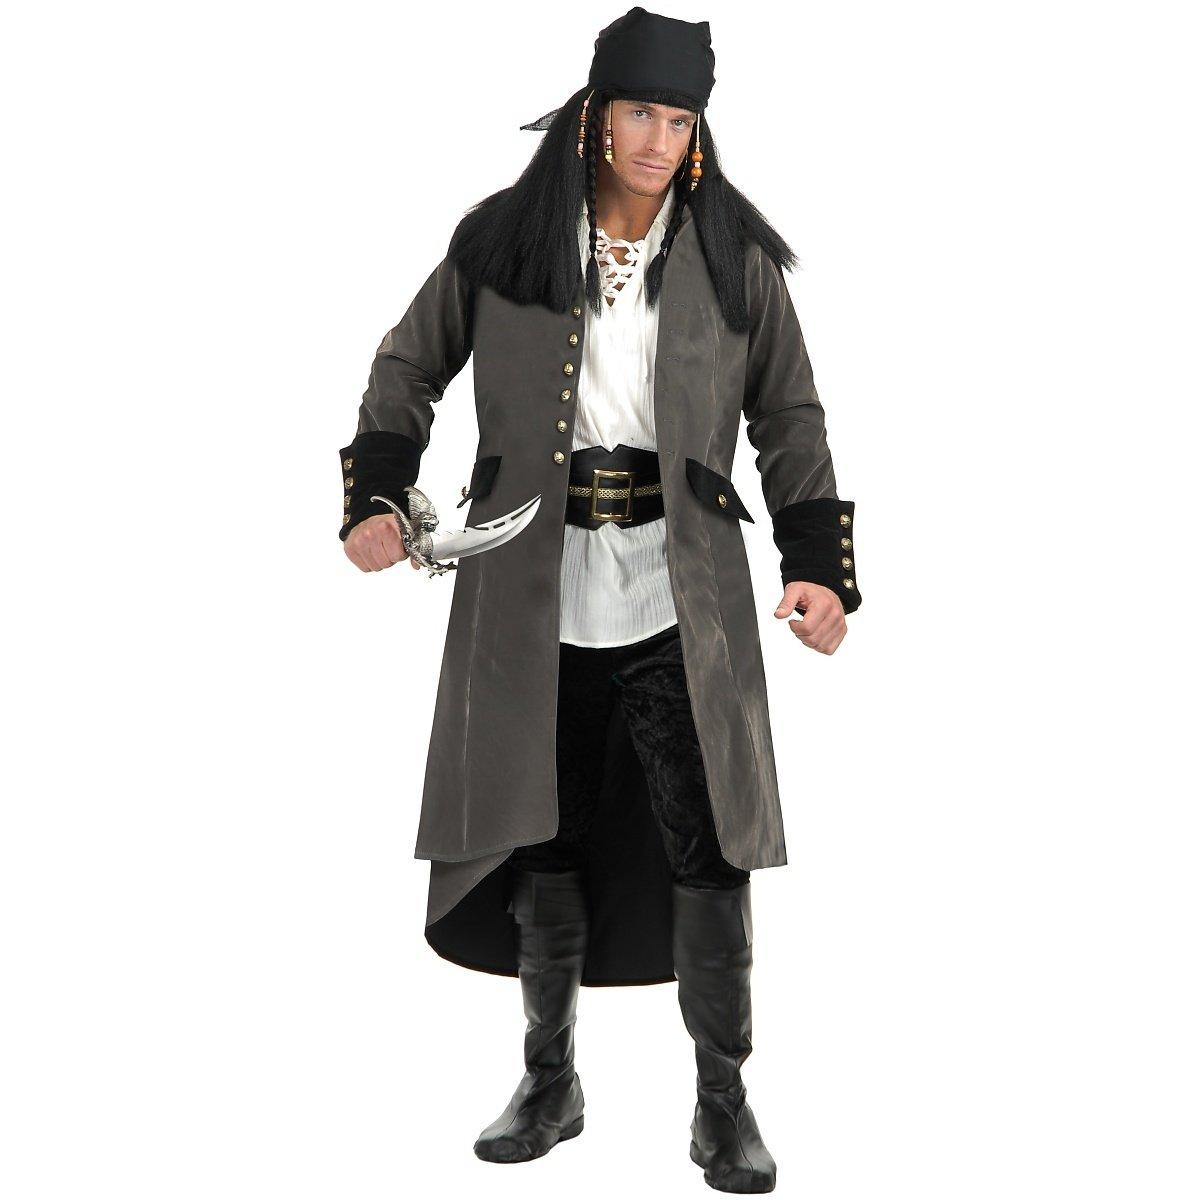 Treasure Island Pirate Adult Costume Grey - Large